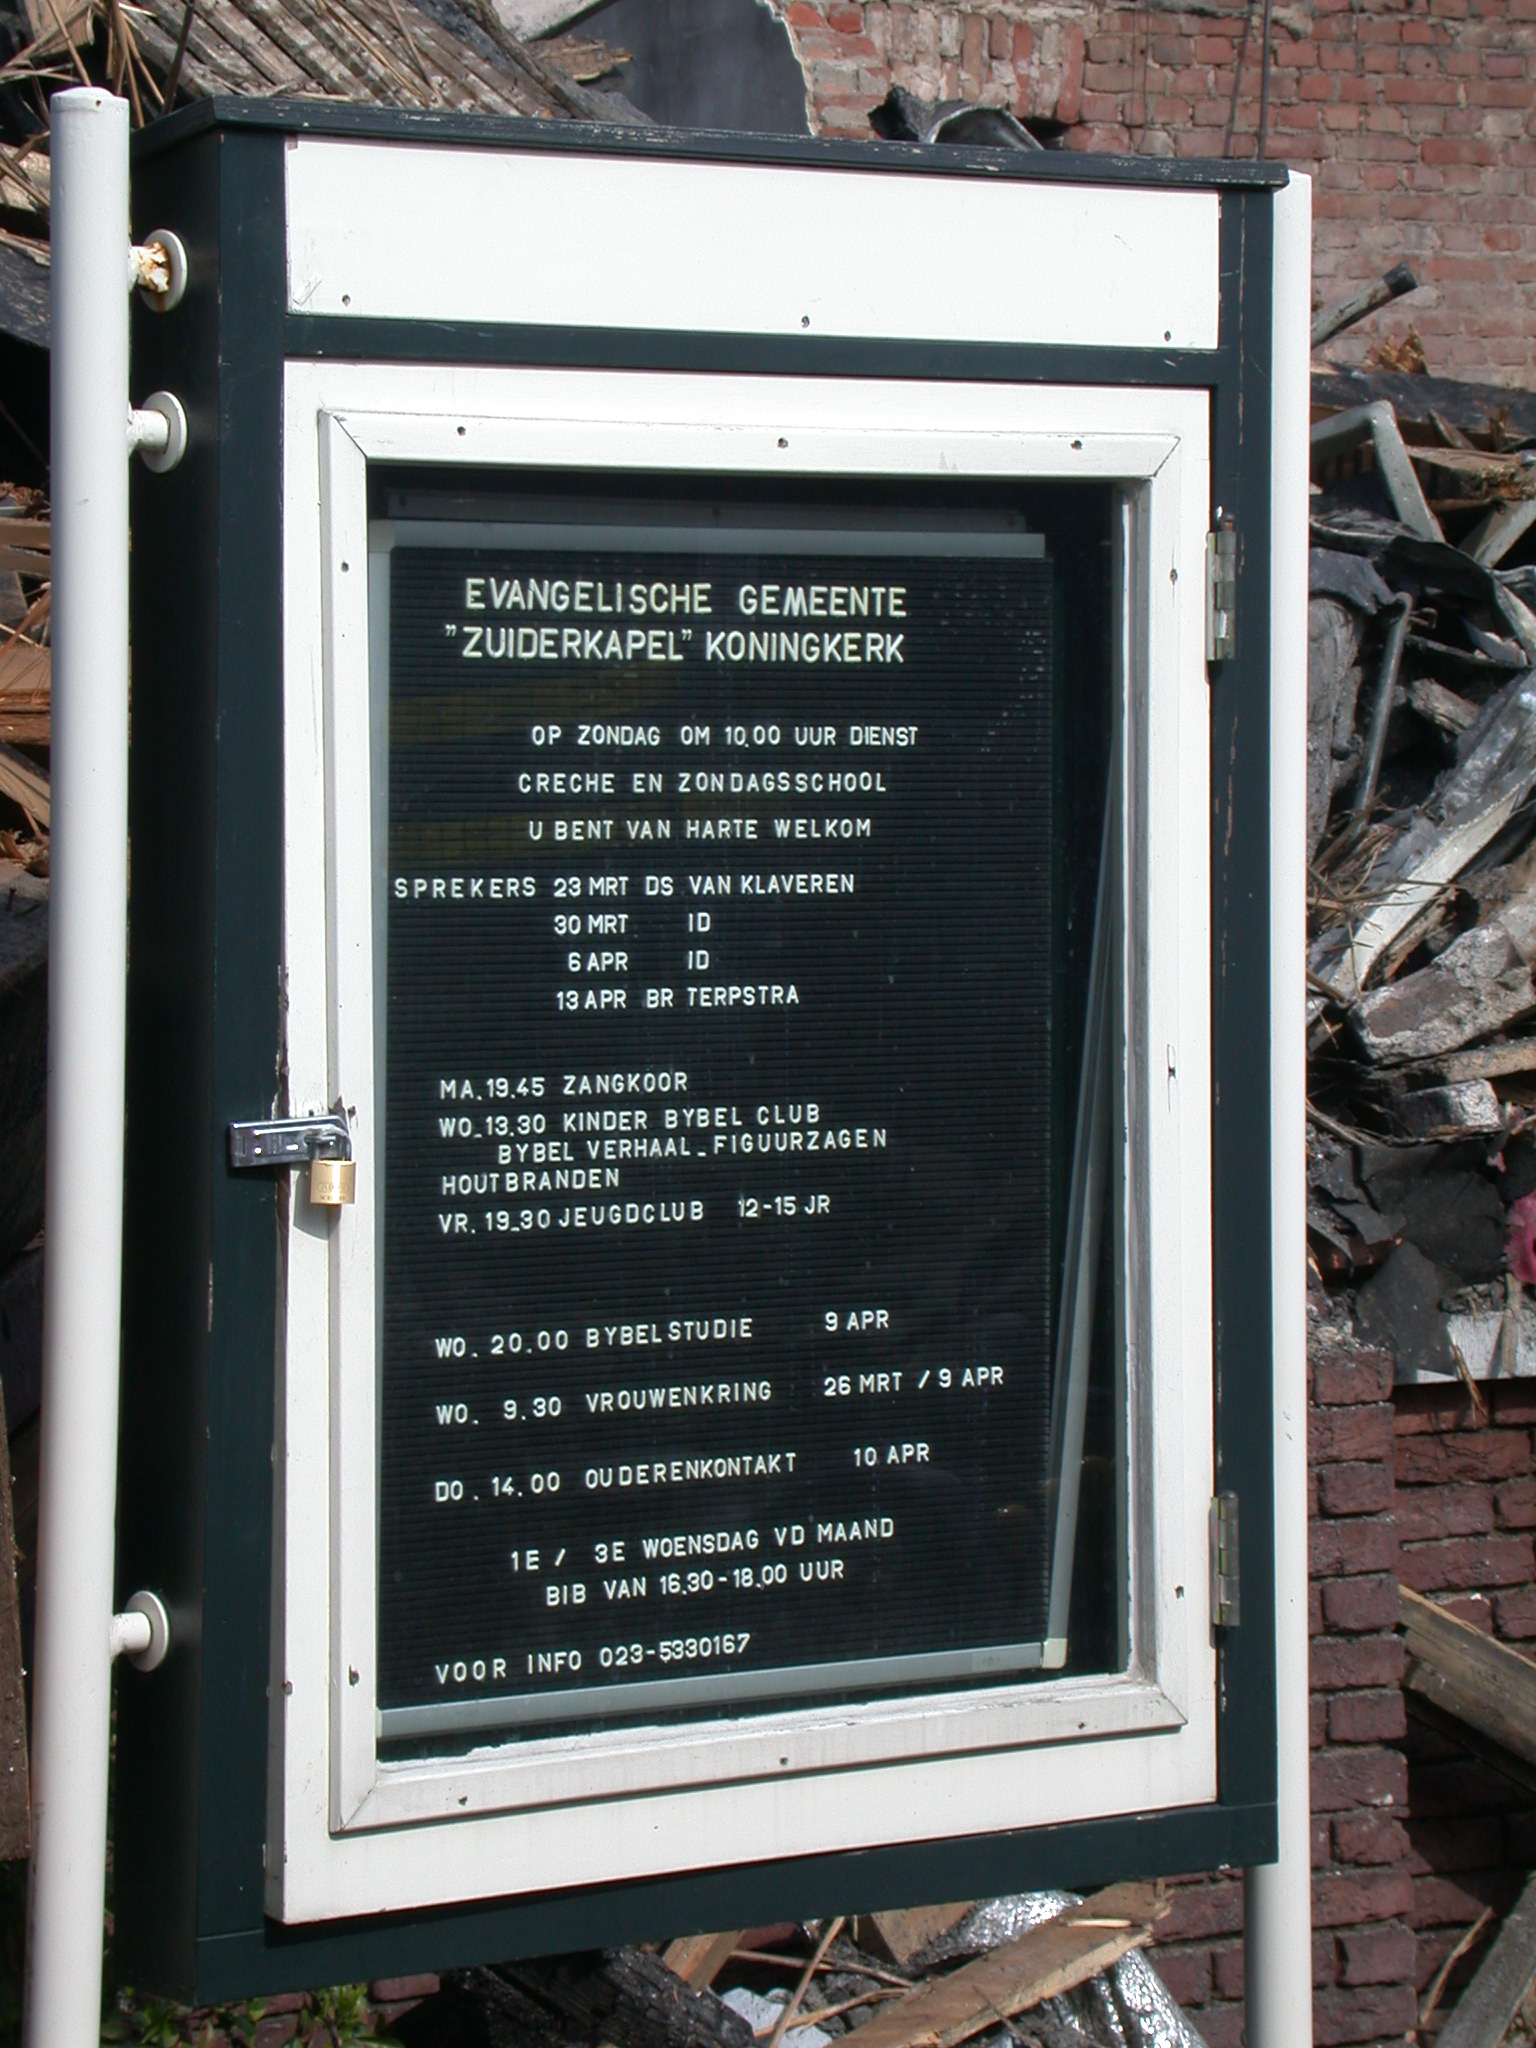 timbetable koningkerk haarlem typo typography modern disaster church churchtimes time agenda plastic